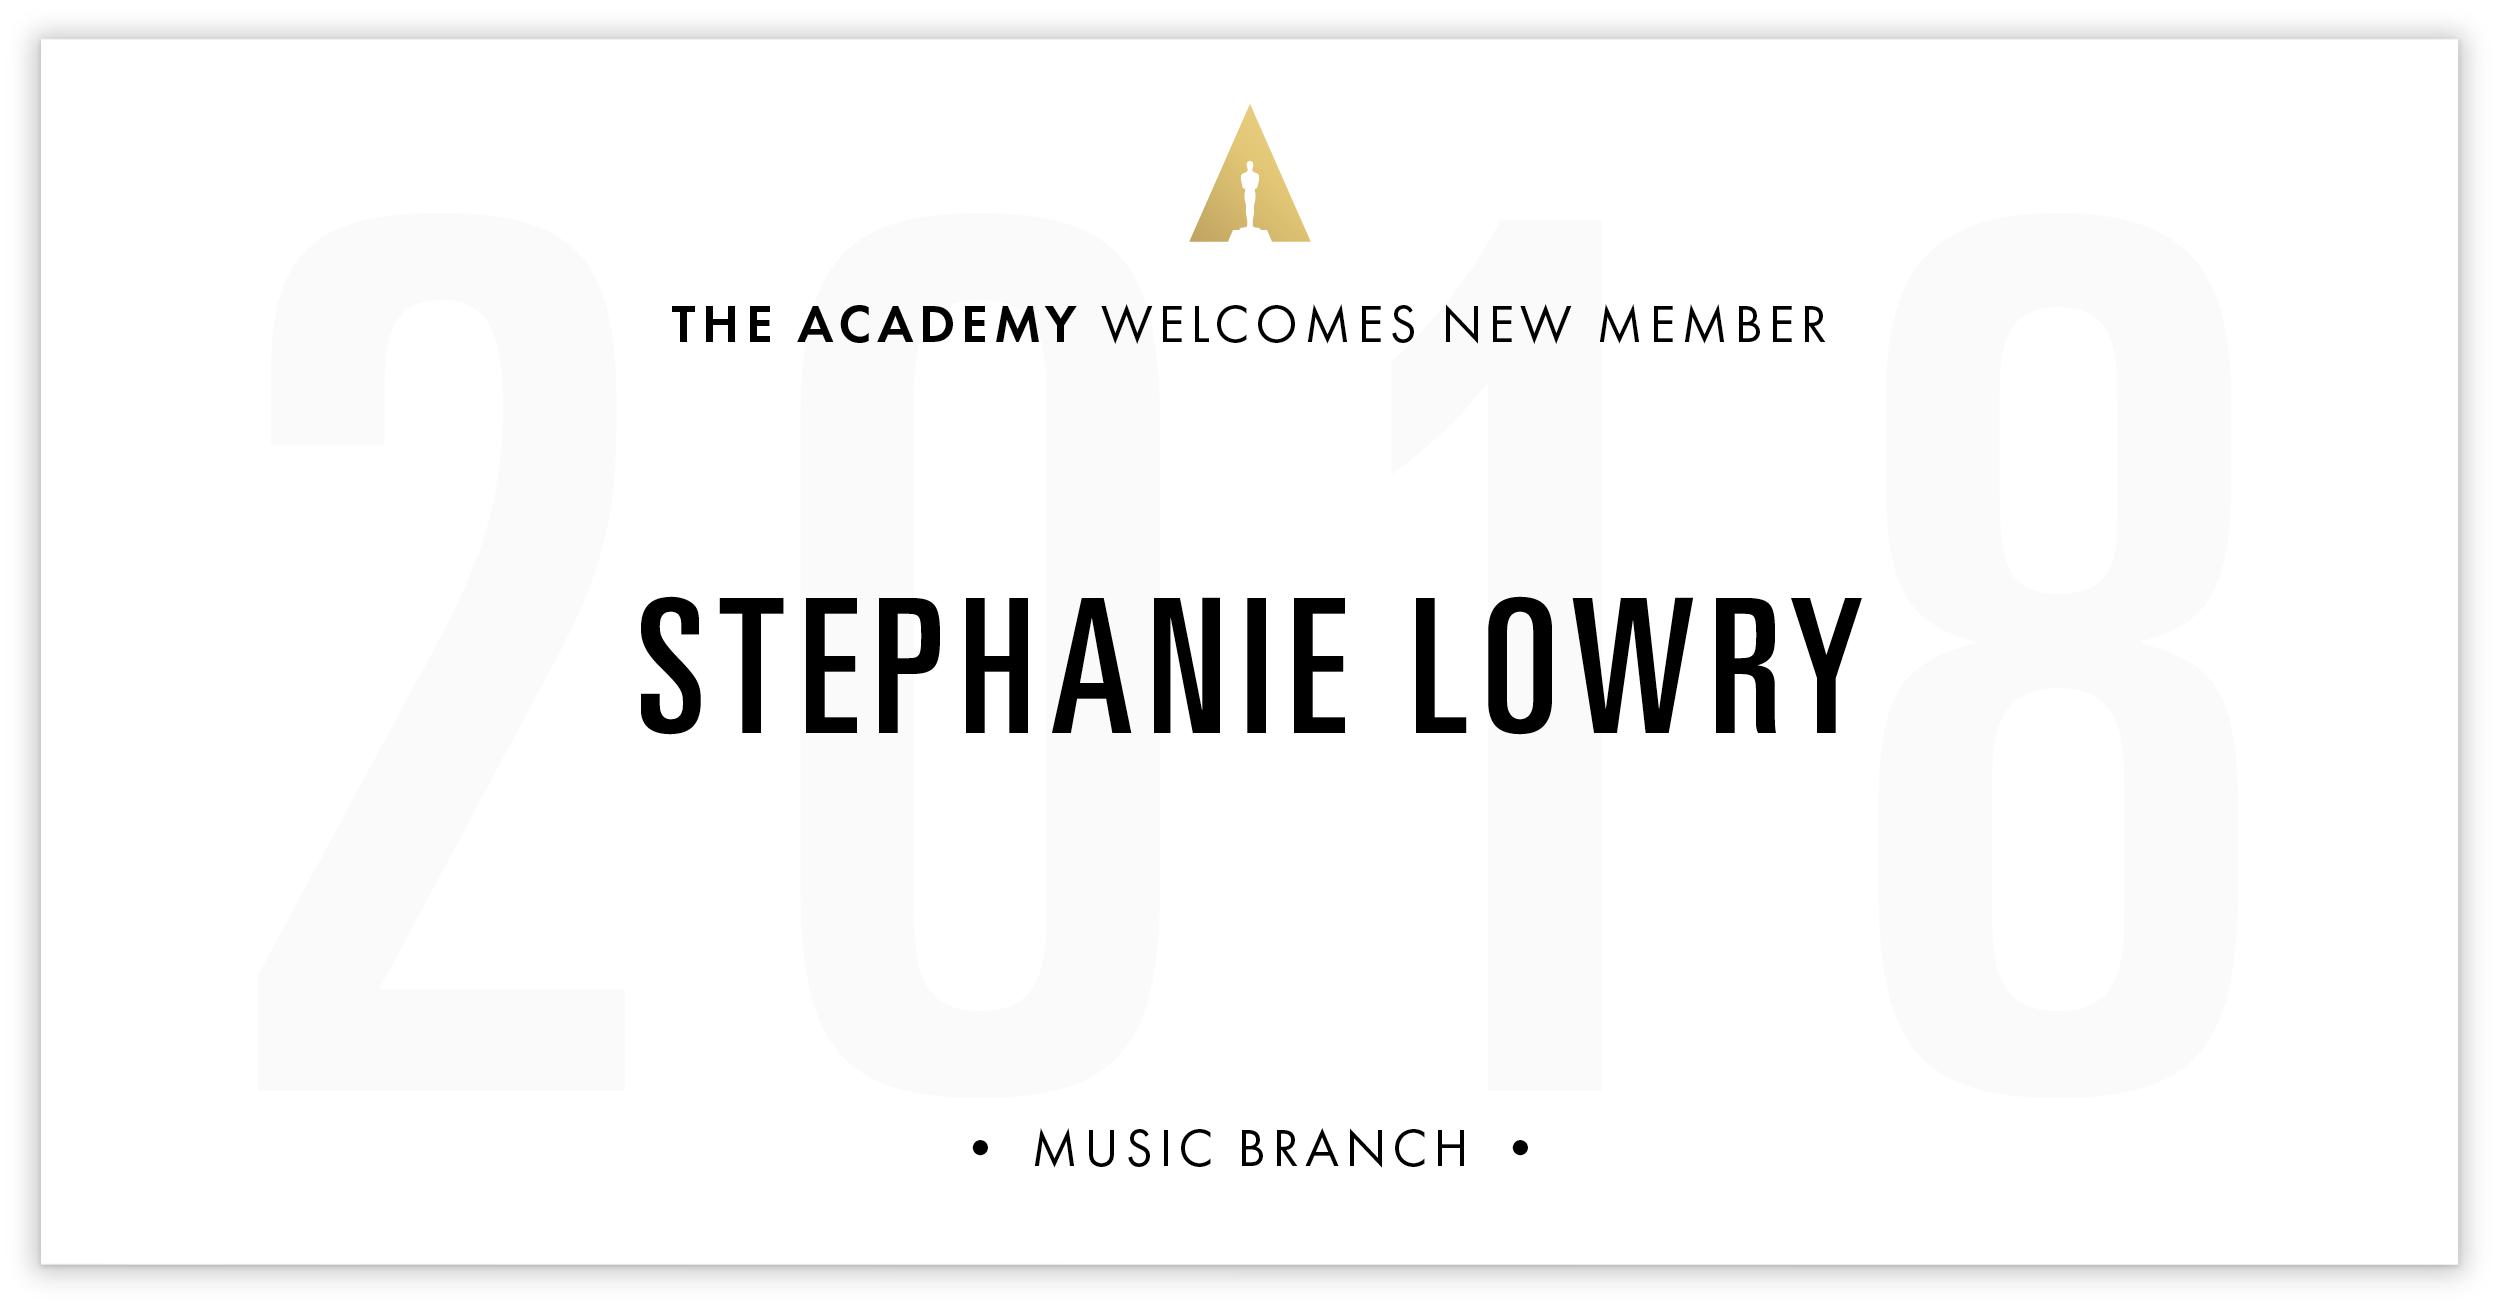 Stephanie Lowry is invited!